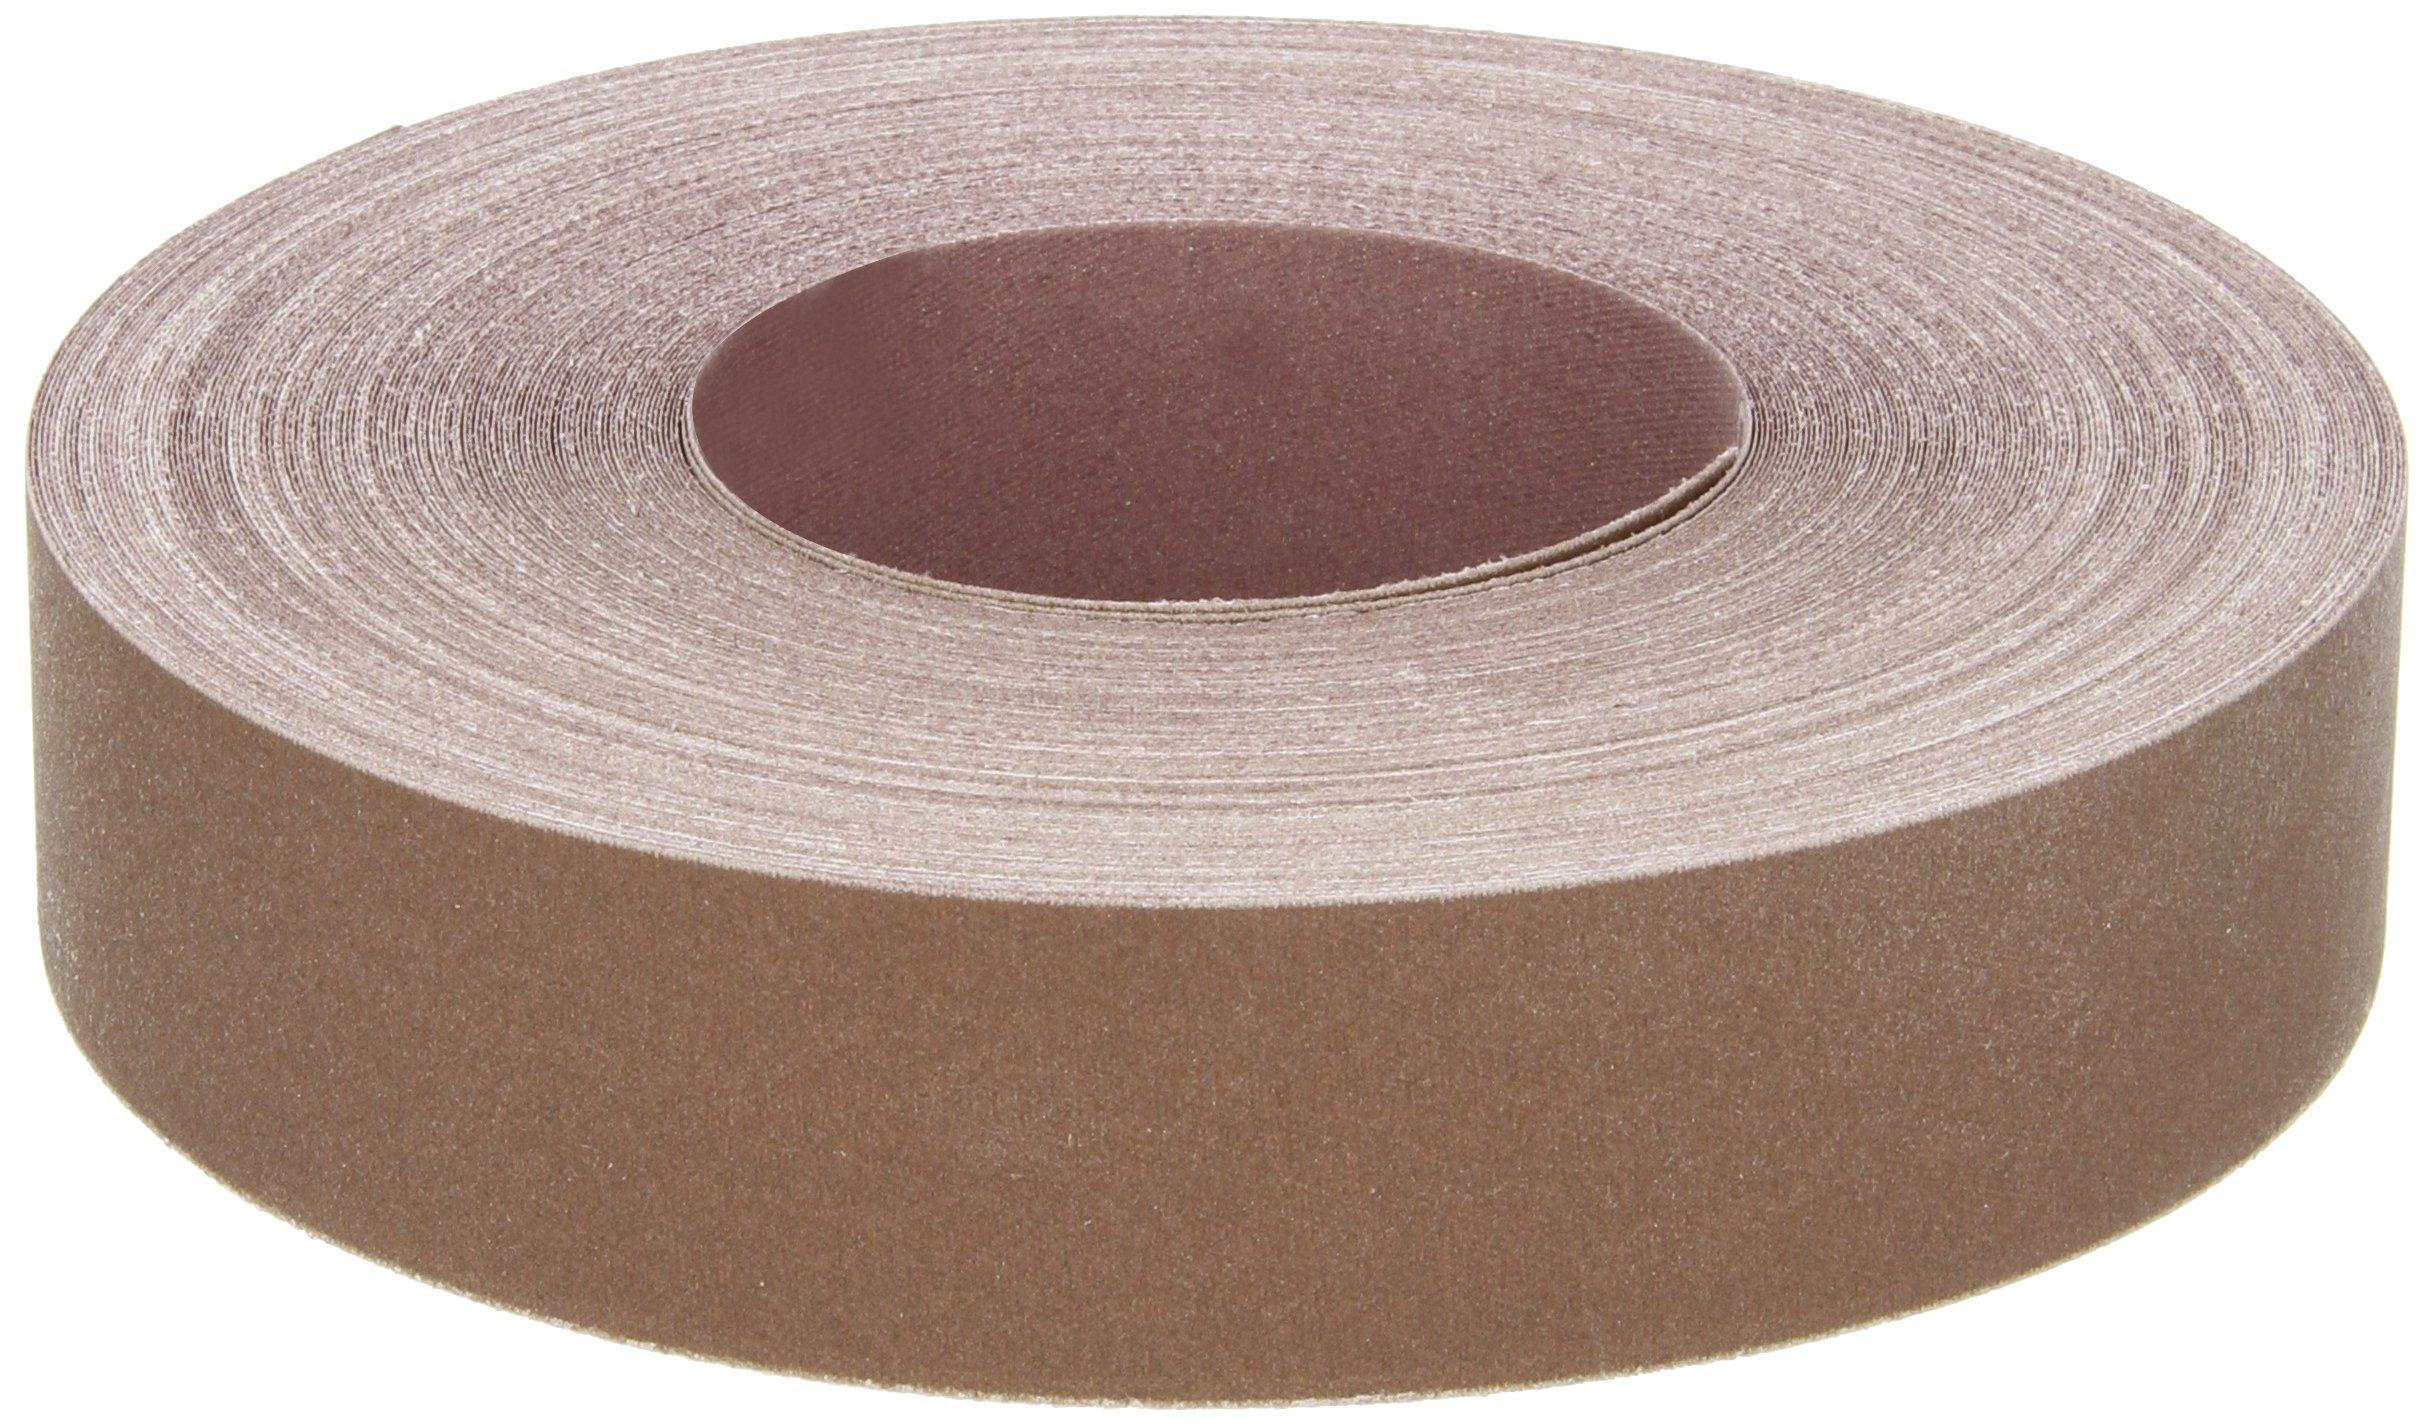 Norton K225 Metalite Abrasive Roll, Cloth Backing, Aluminum Oxide, 1-1/2'' Width x 50yd Length, Grit P400